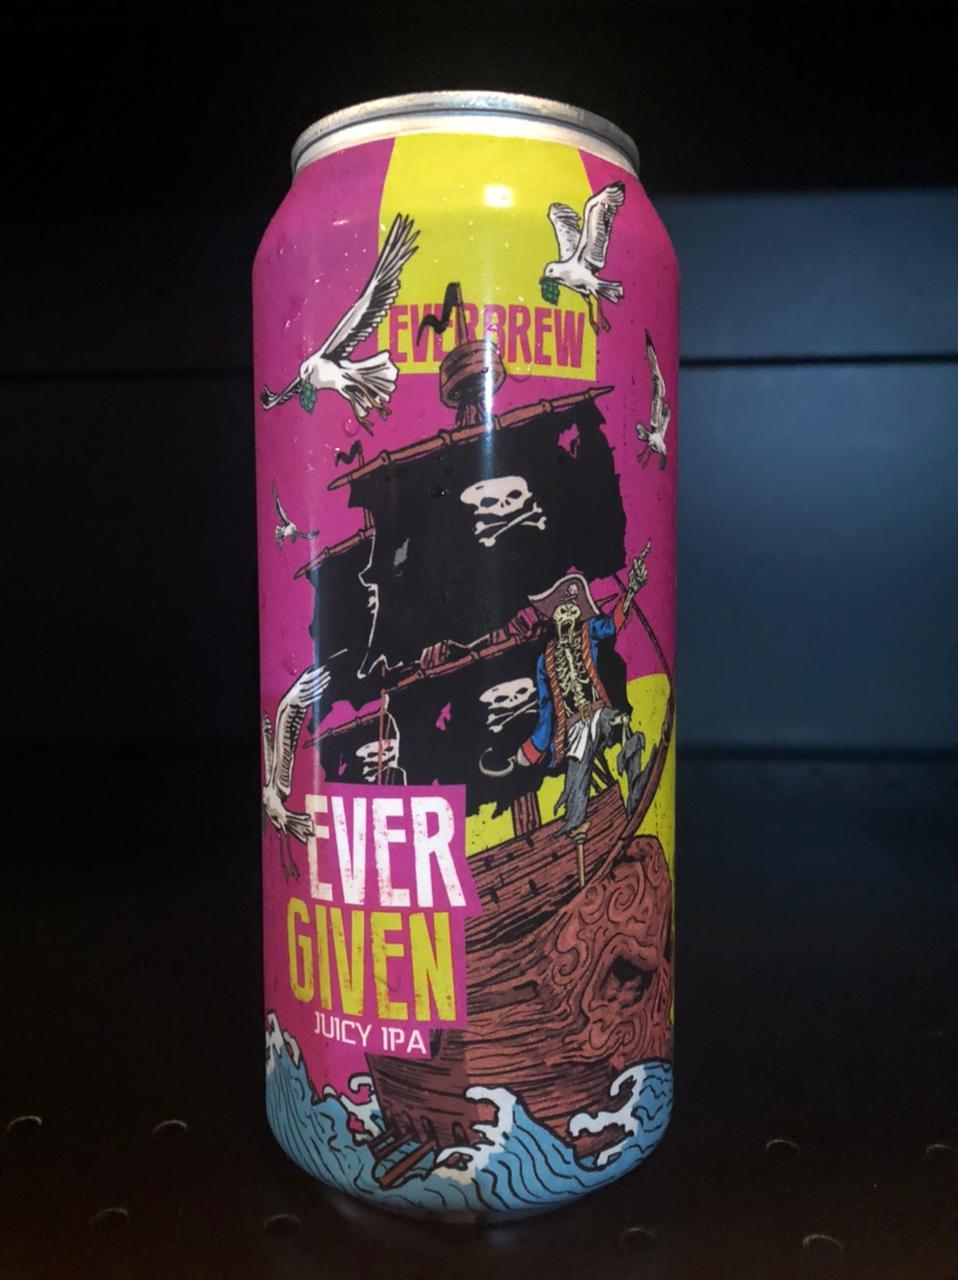 Everbrew Evergiven Lata 473ml - Juicy IPA